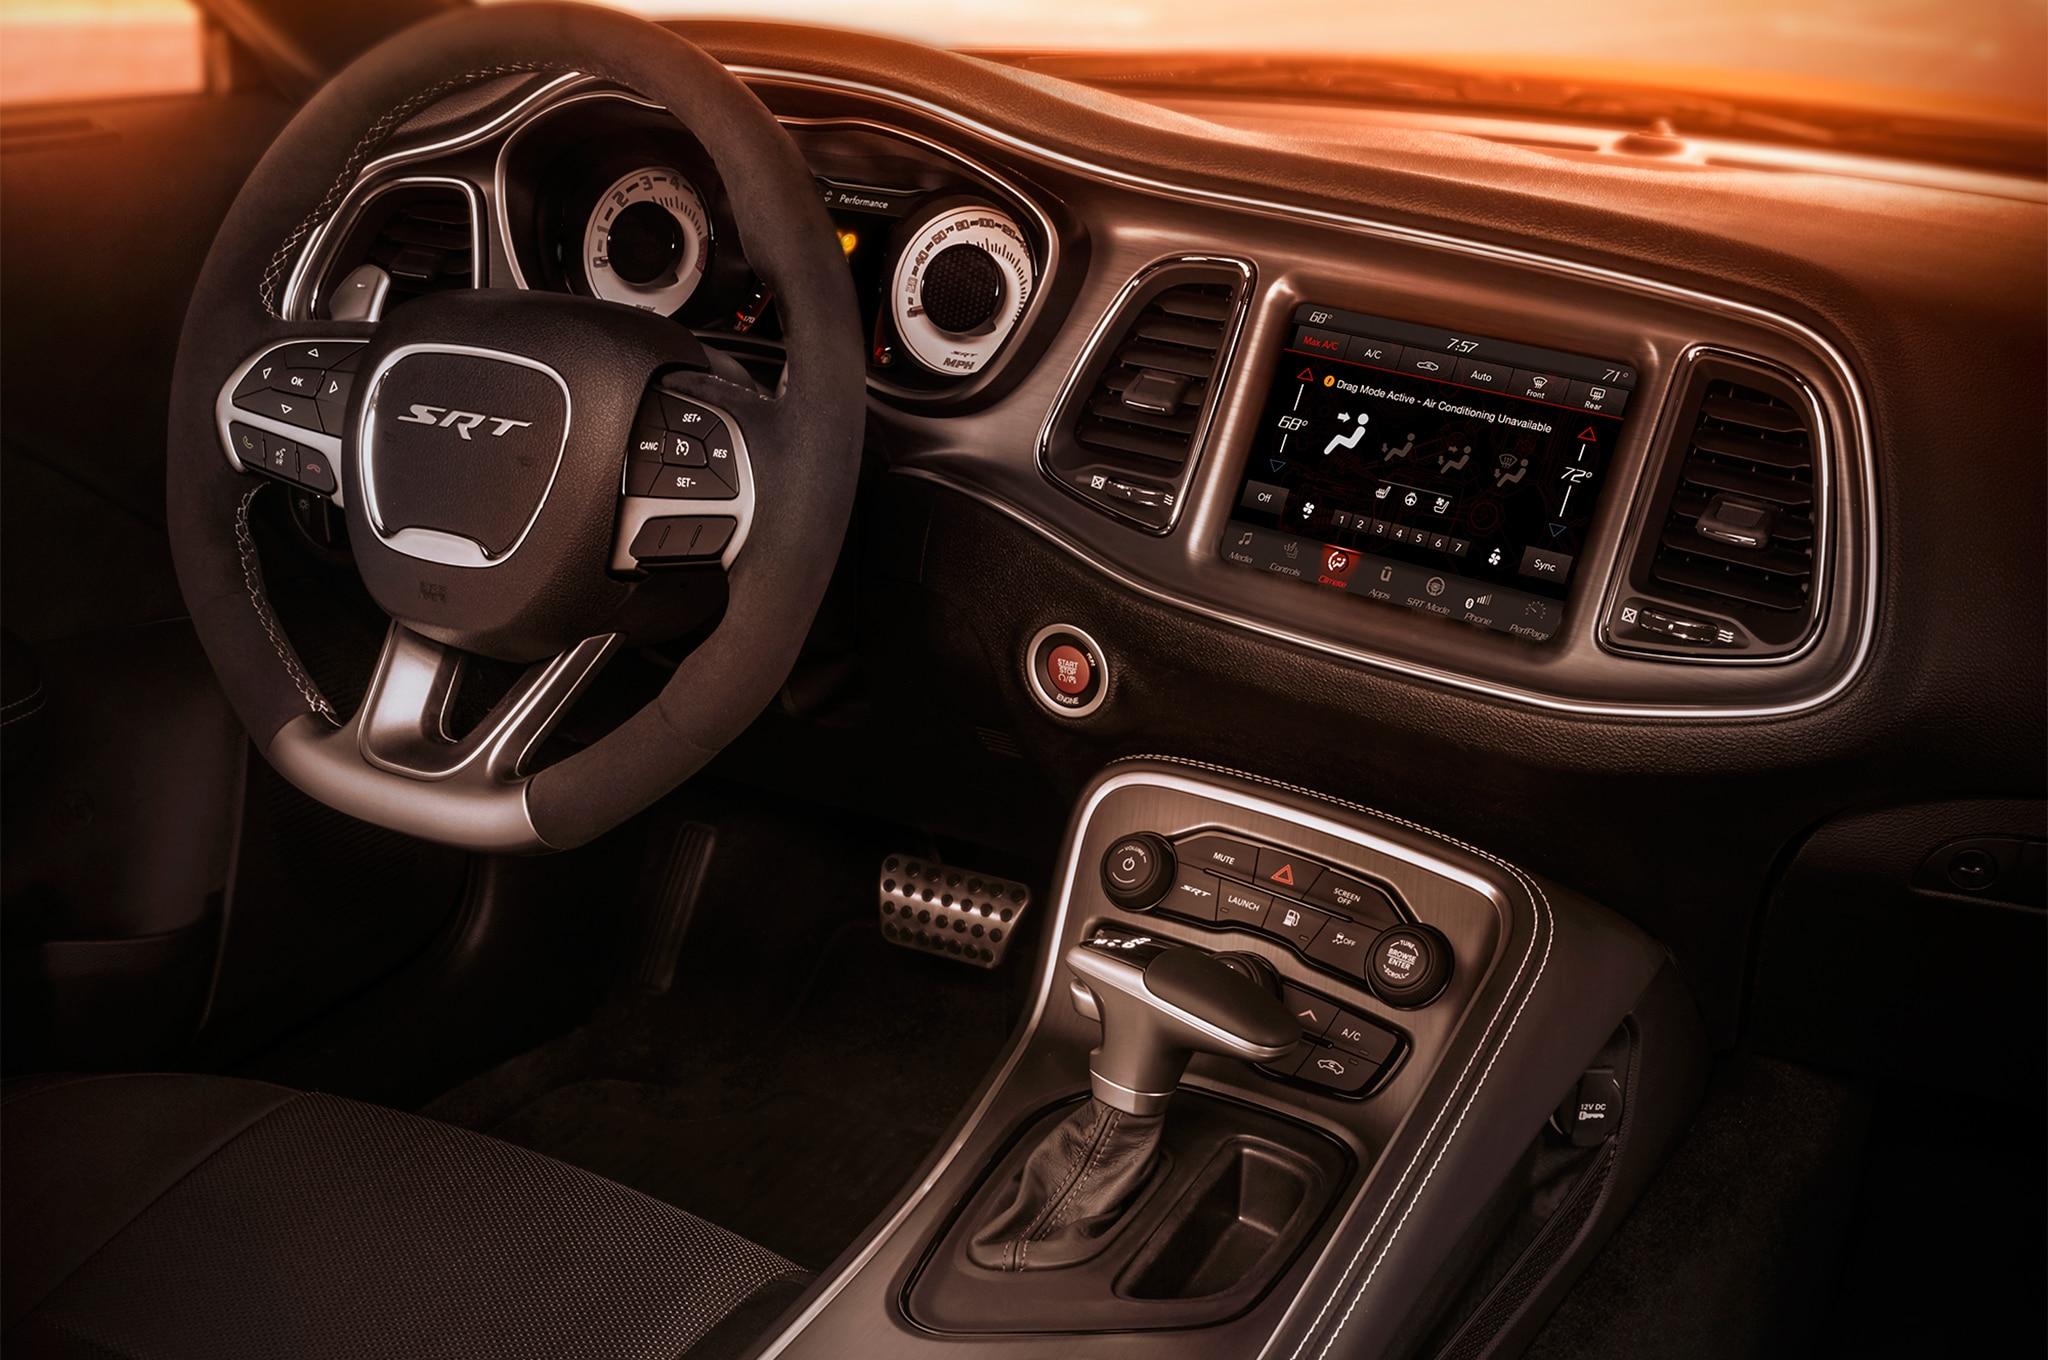 2018 Dodge Challenger SRT Demon Arrives with 840 Horsepower for the Track | Automobile Magazine